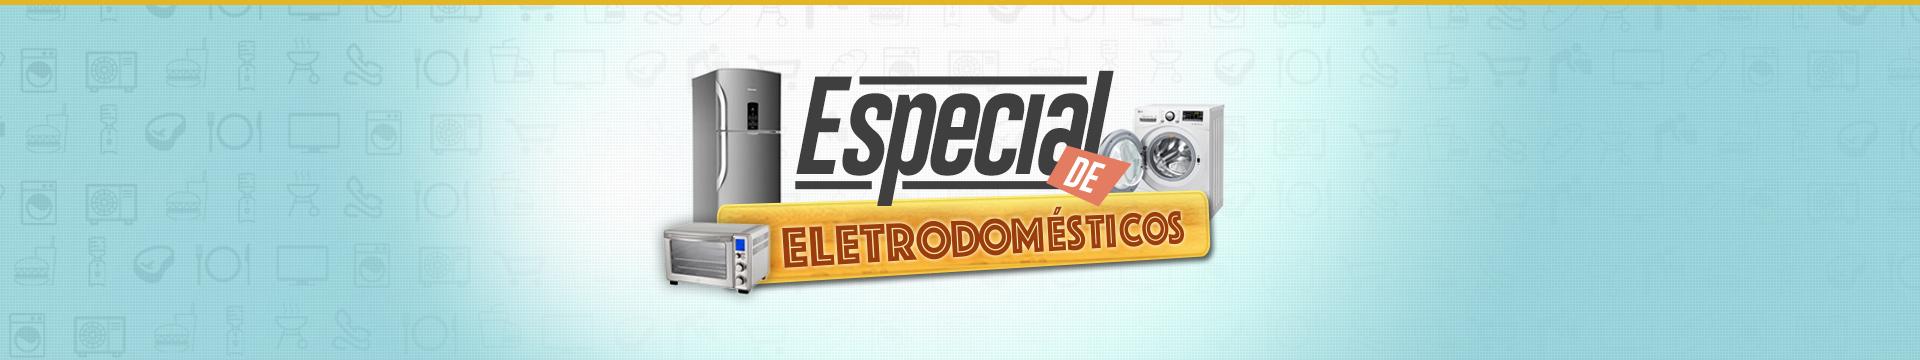 Especial Eletrodomésticos - Capa